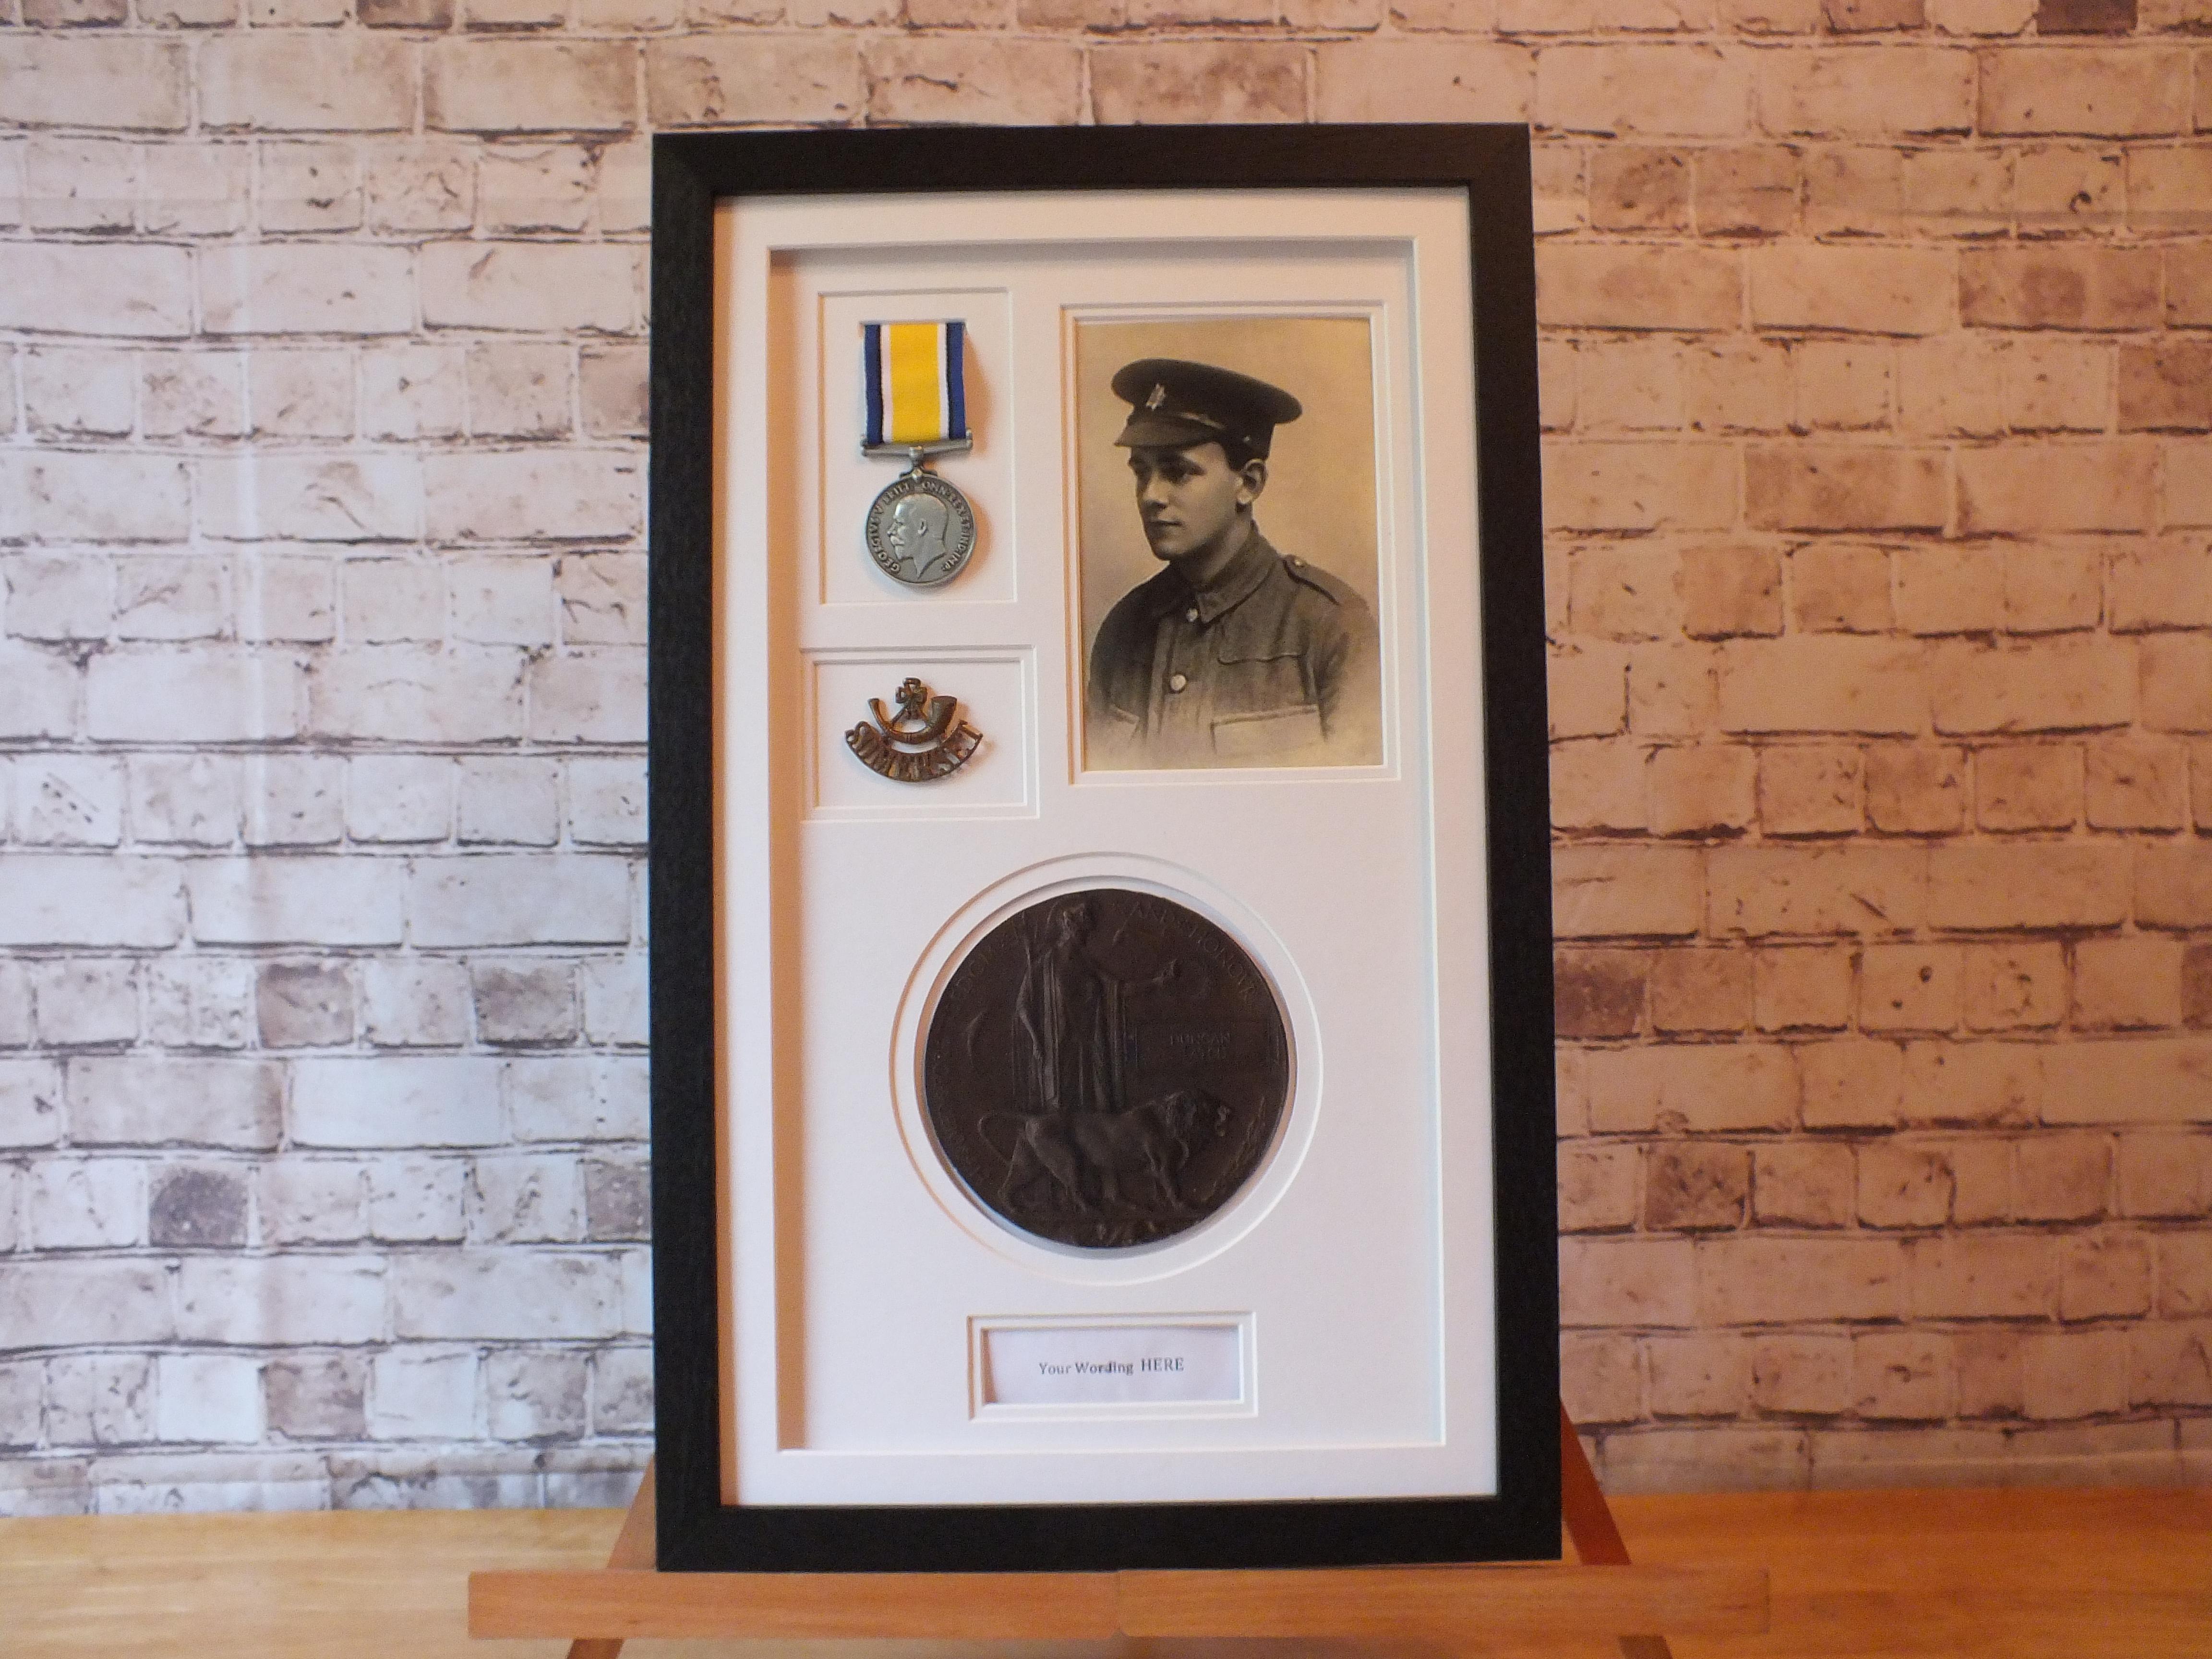 Death Penny Medal Frame - 1x Ribbon Medal - Cap Badge & Title box